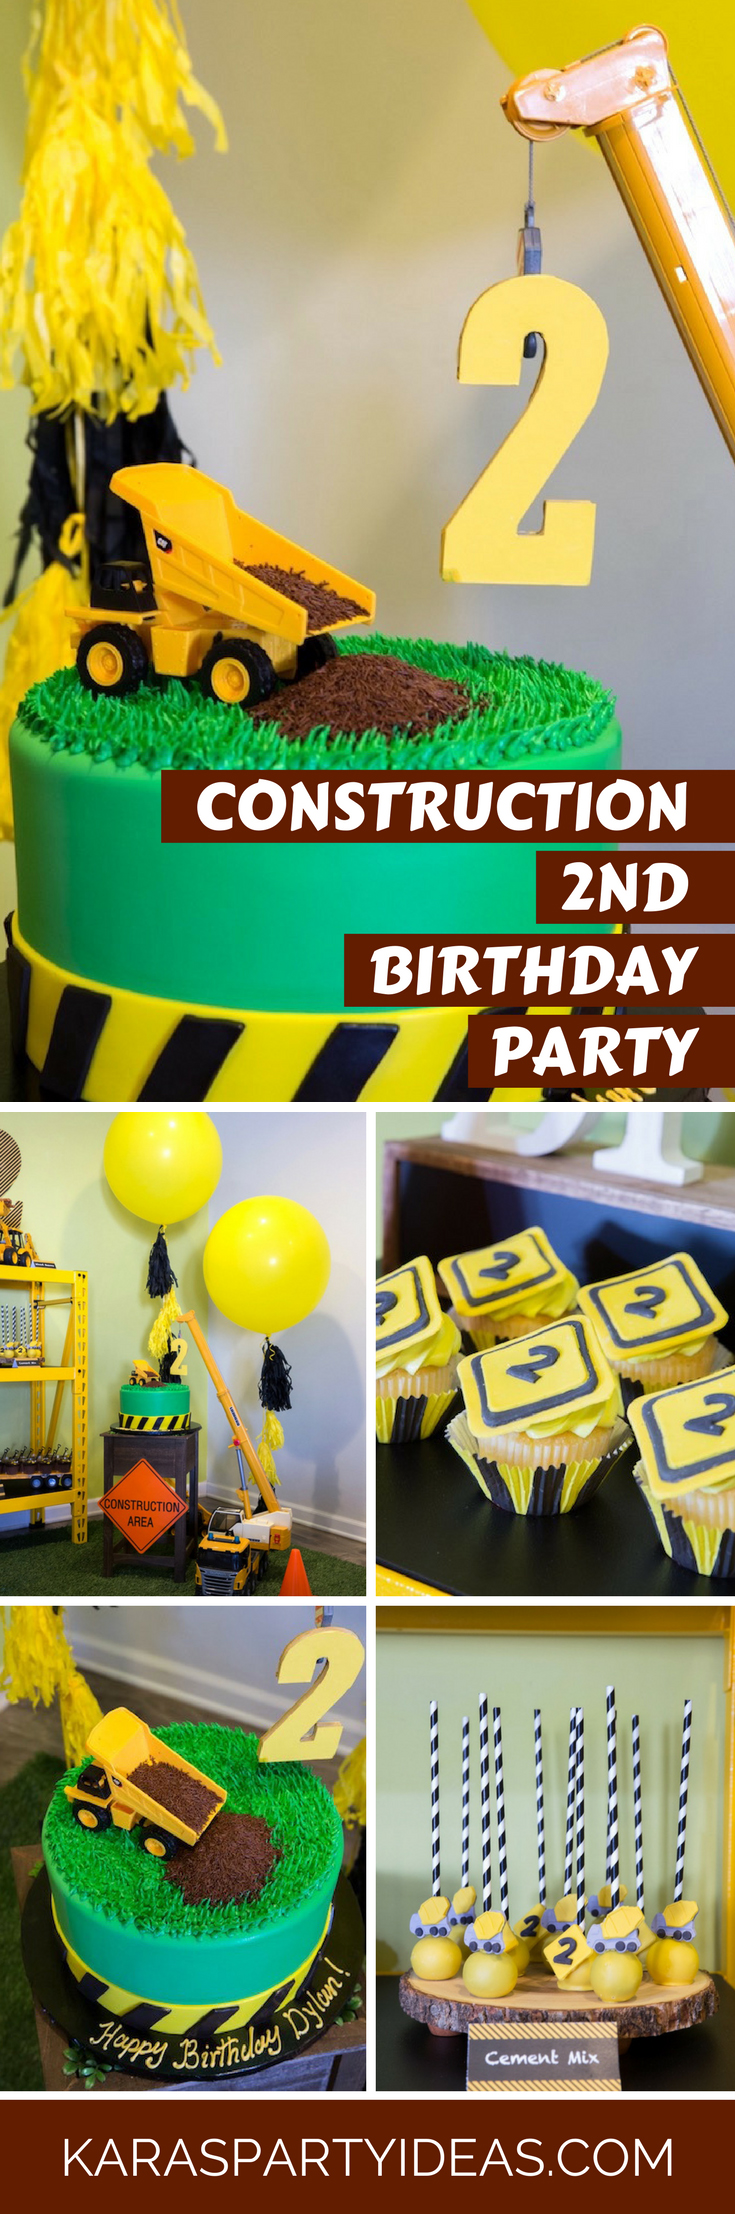 Construction 2nd Birthday Party via Kara's Party Ideas - KarasPartyIdeas.com